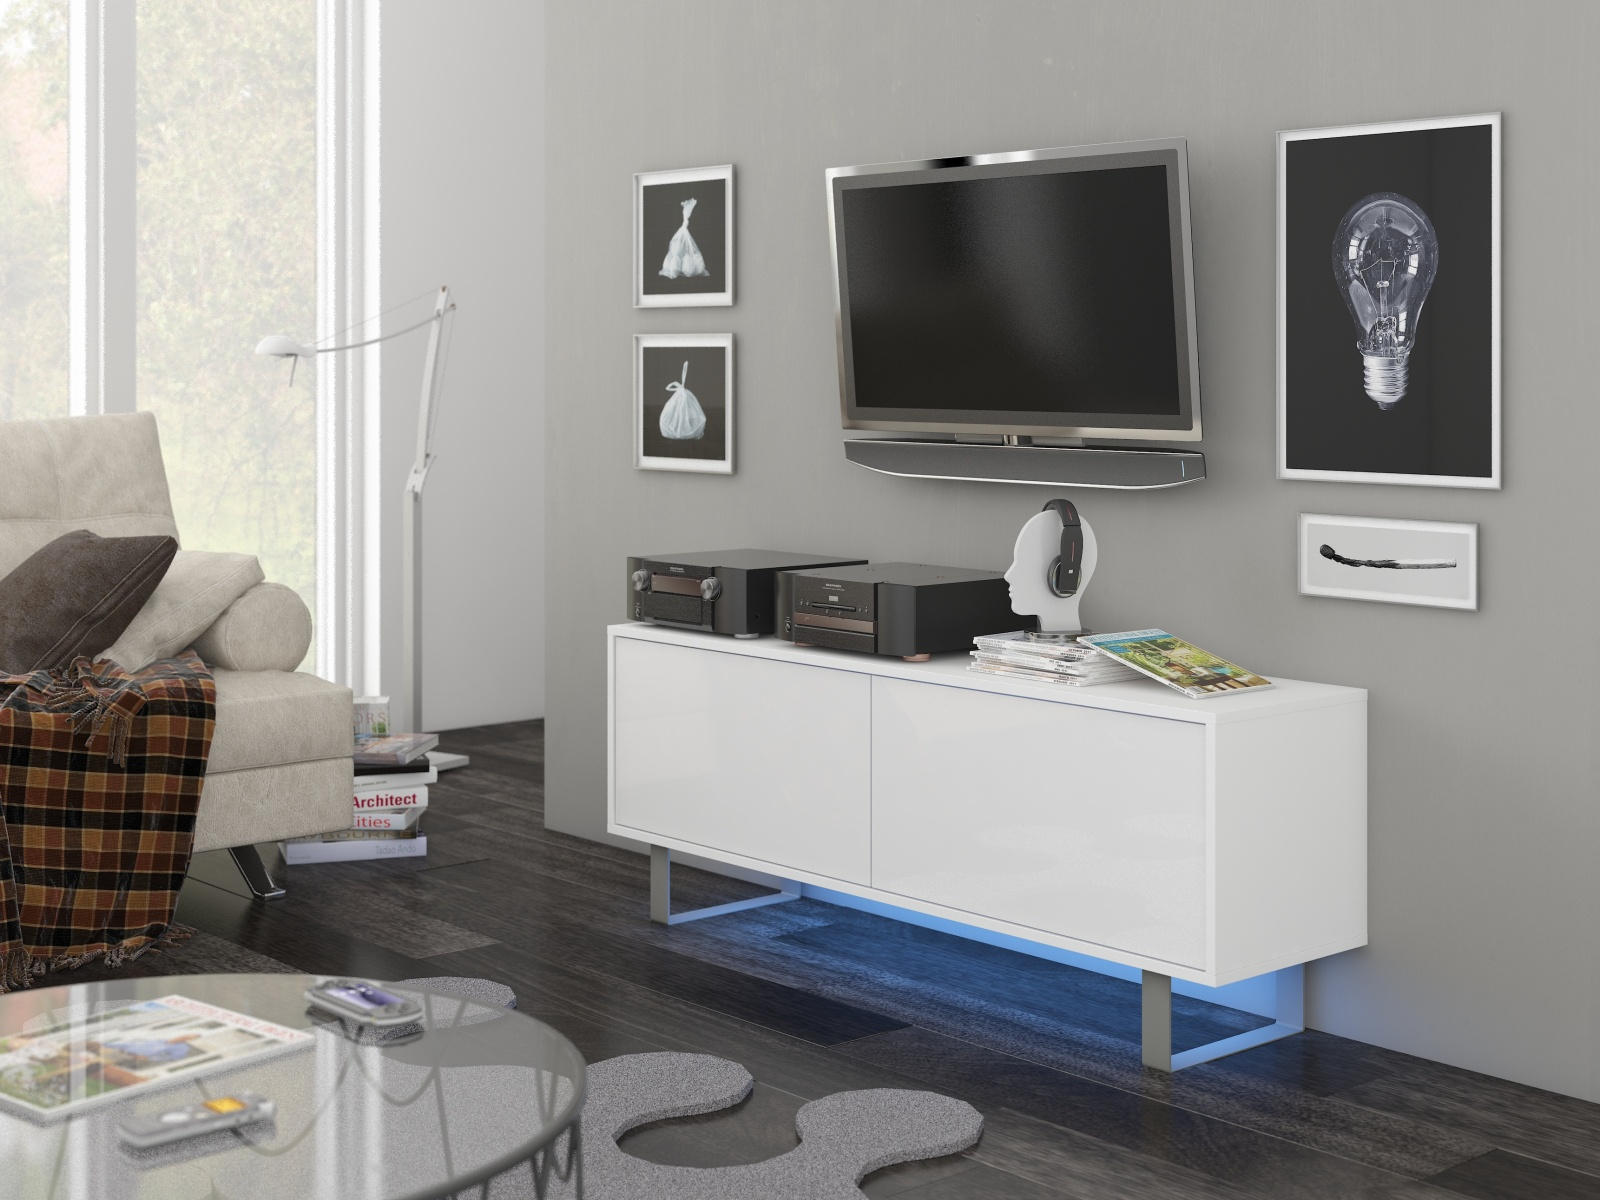 MORAVIA FLAT KING 1 TV stolek, bílá/bílý lesk